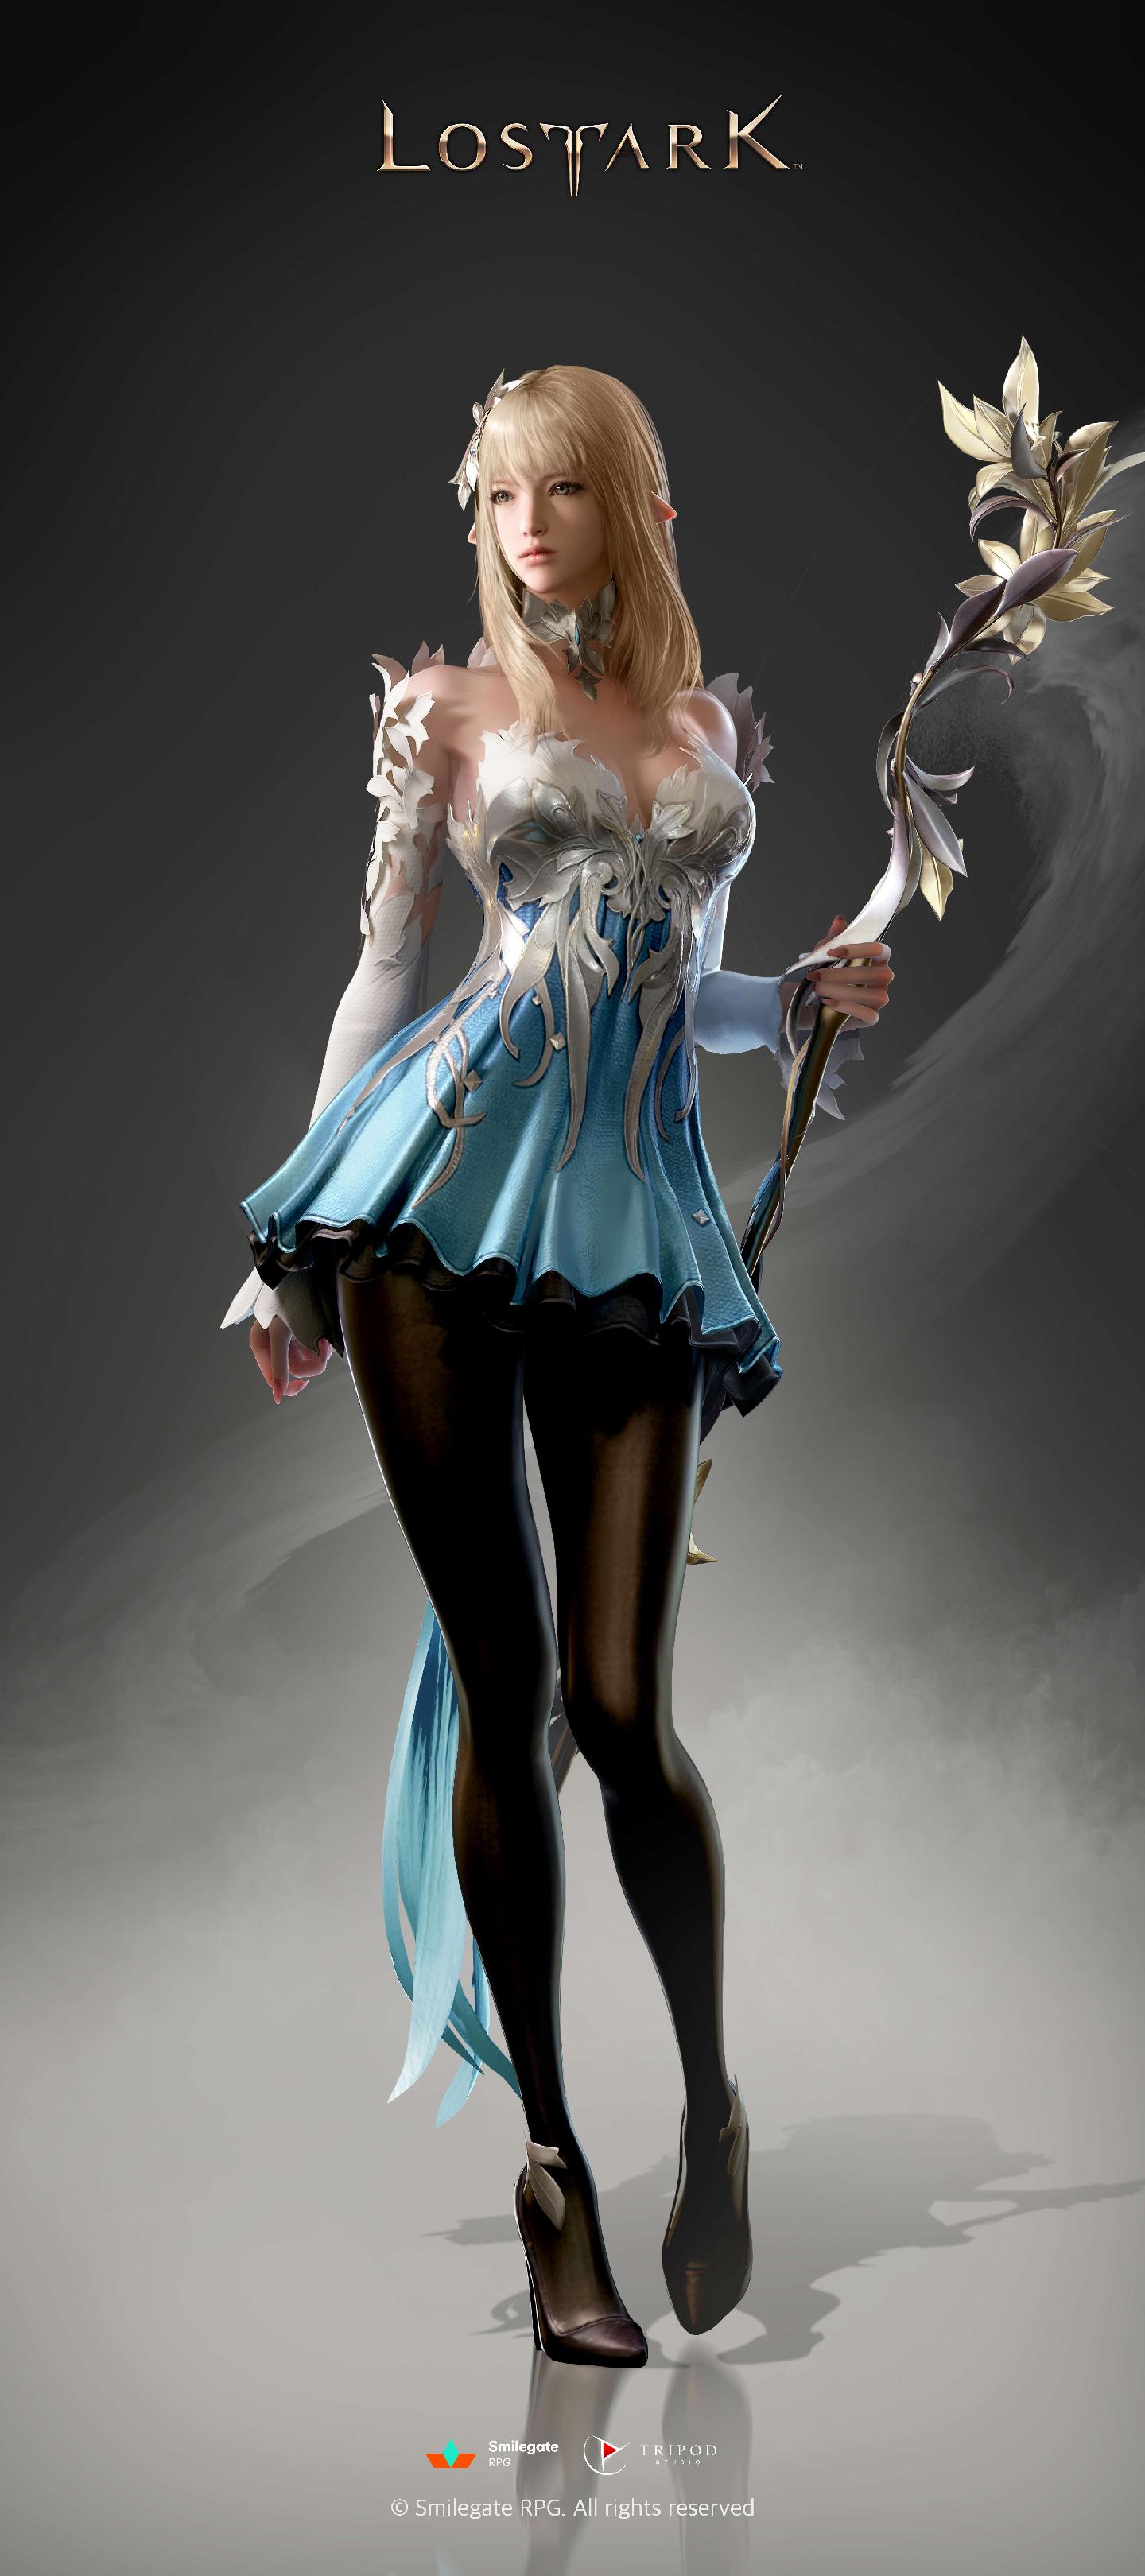 Artstation Magician Costume Design For Lostark Shumolly Magician Costume Costume Design The Magicians